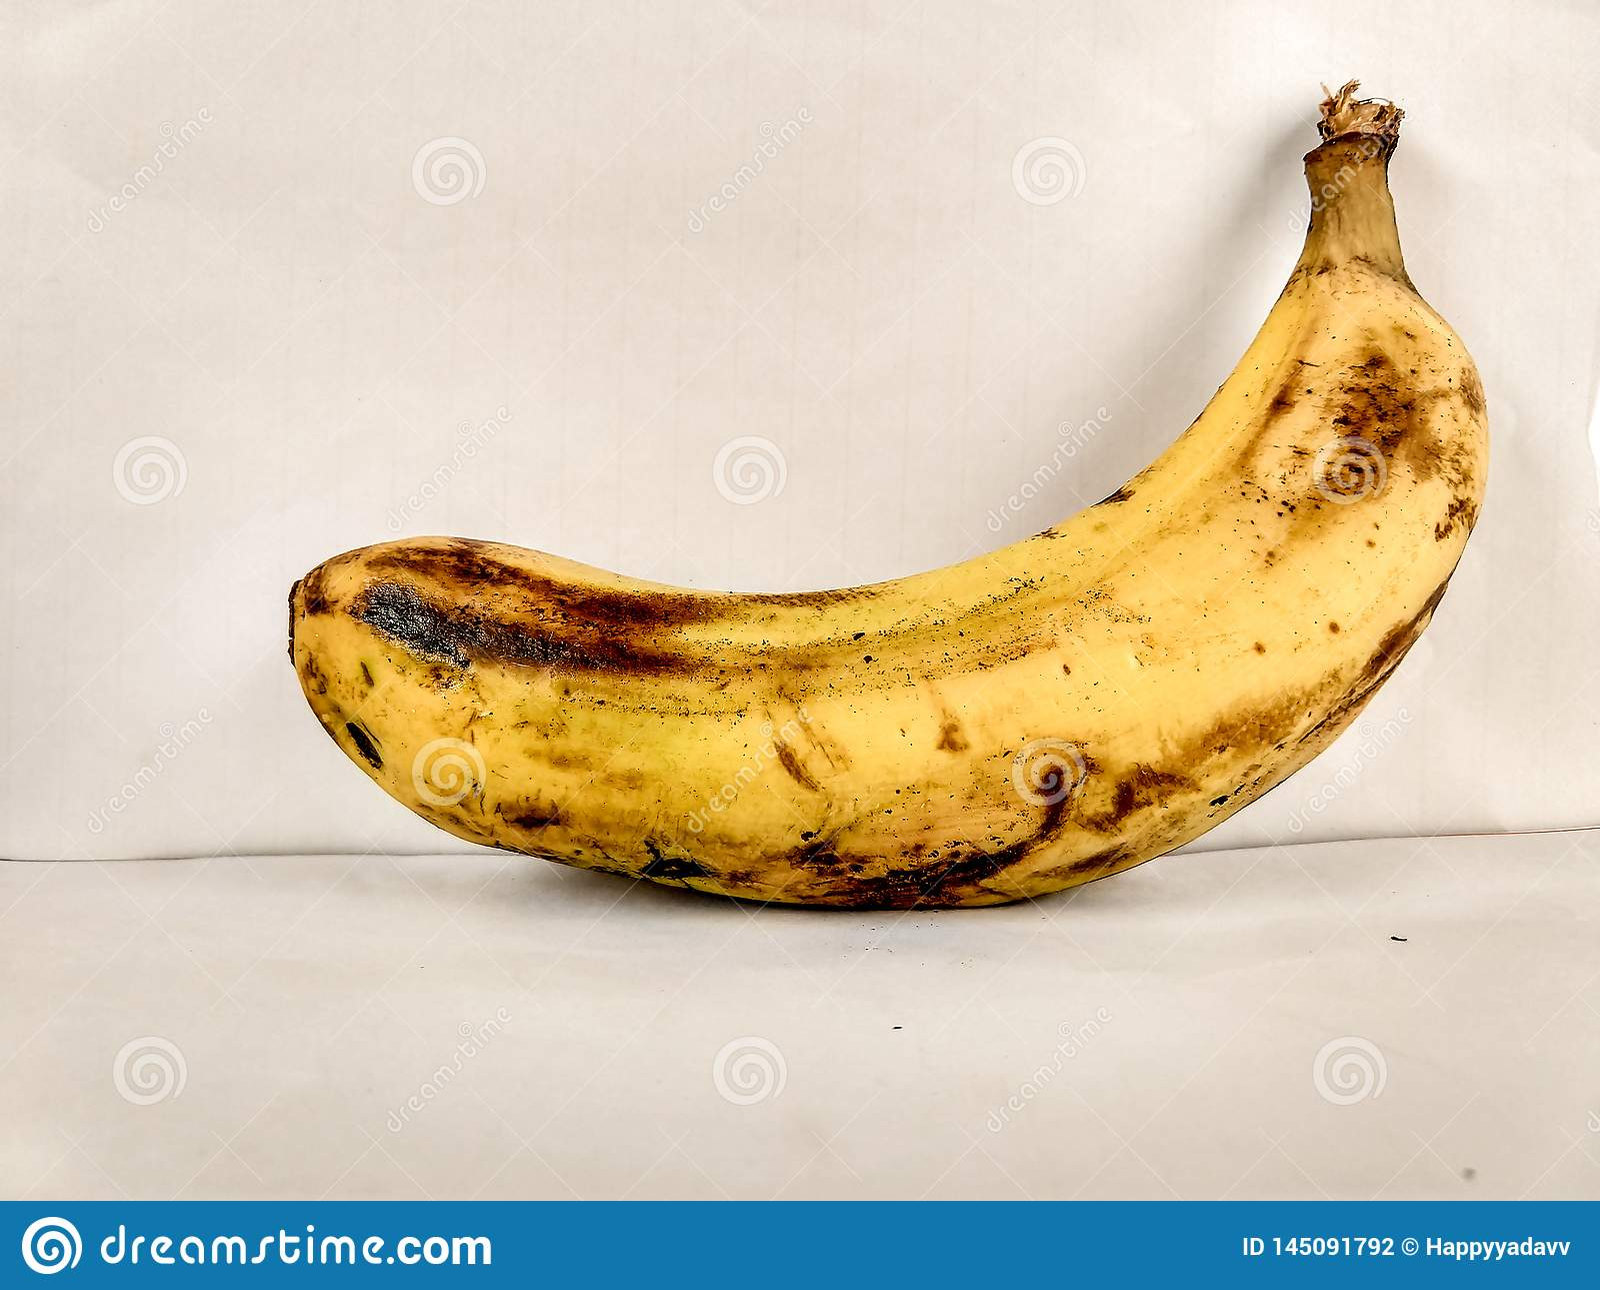 Beautiful  image of the healthy Banana